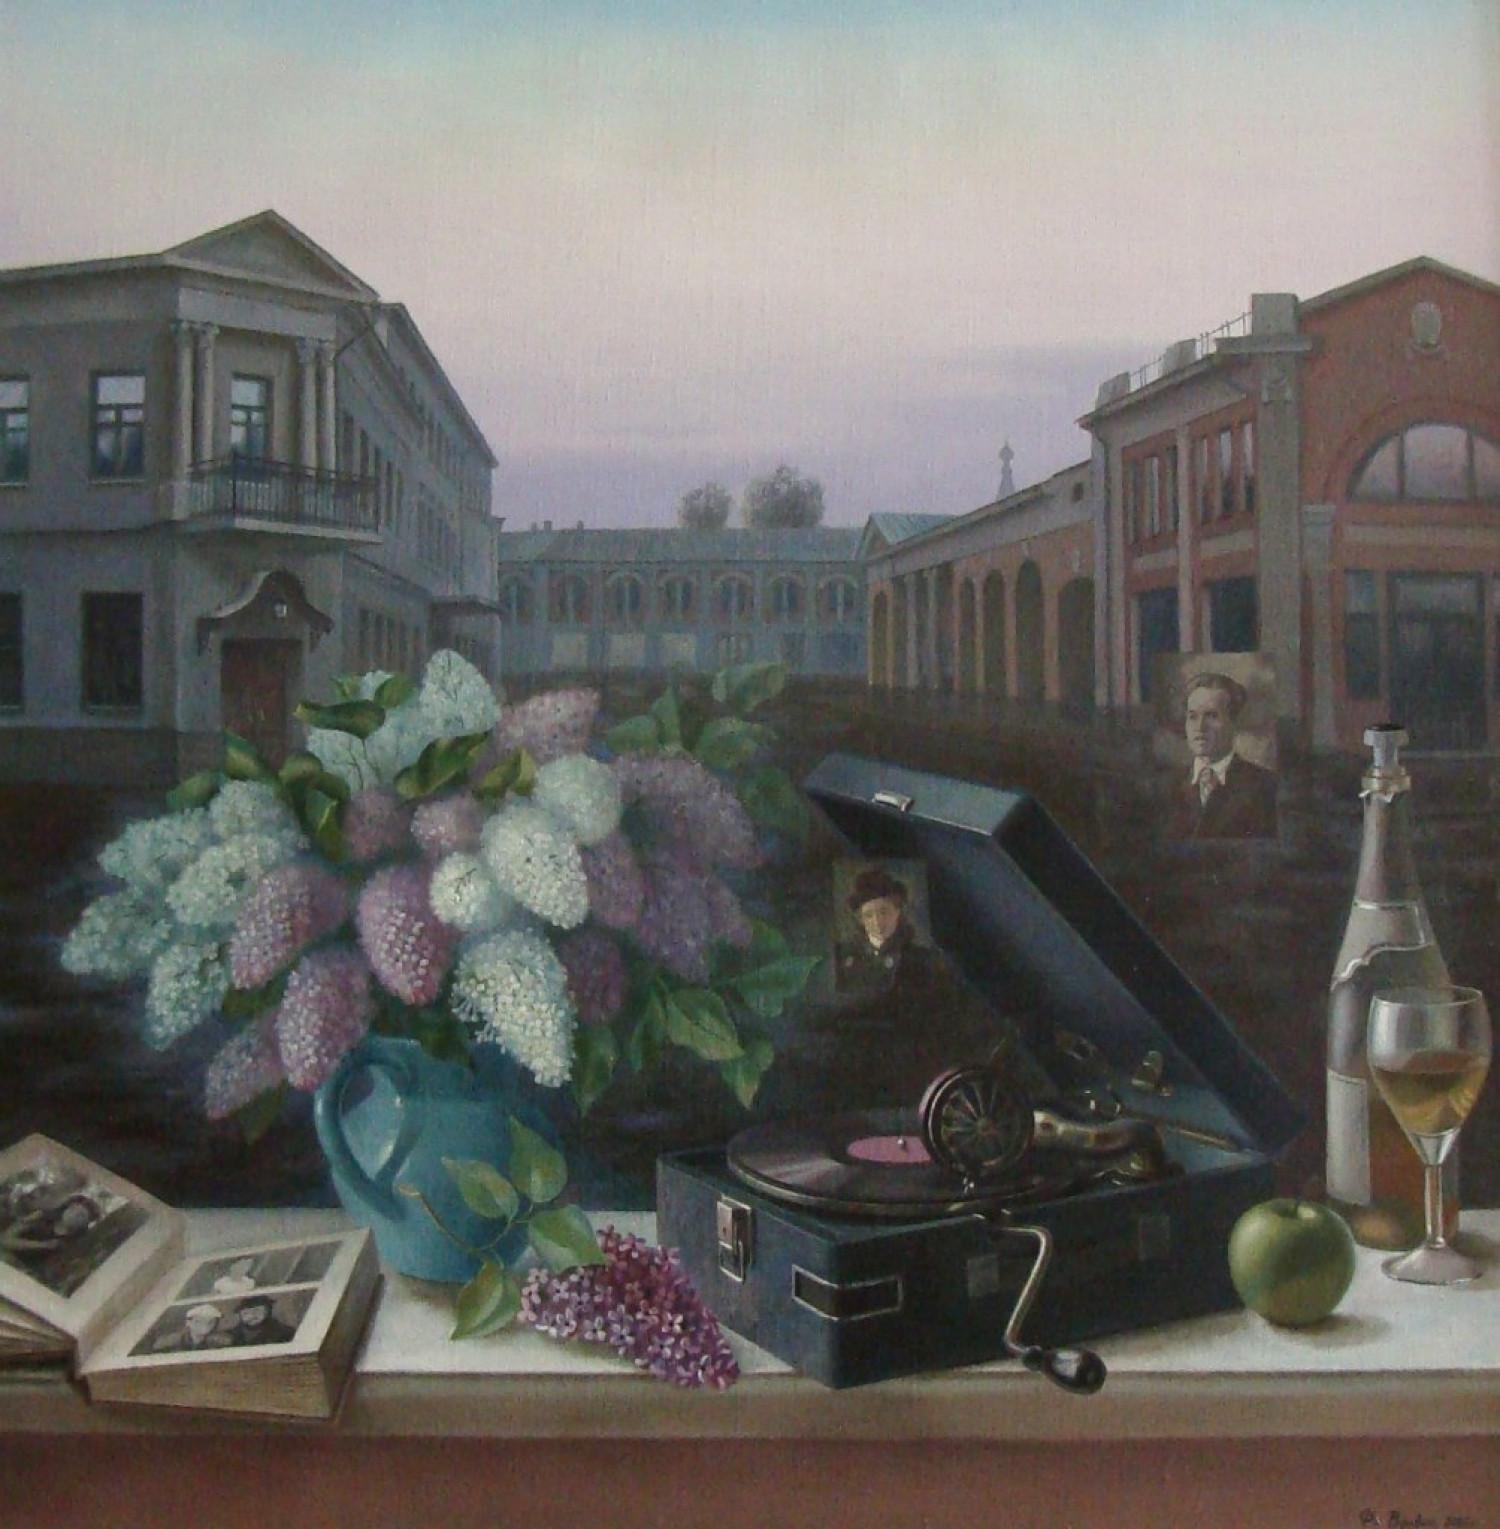 Ф.Ф. Вдовин. Мелодия воспоминаний. 2005 г. Холст, масло. 90х95 см.